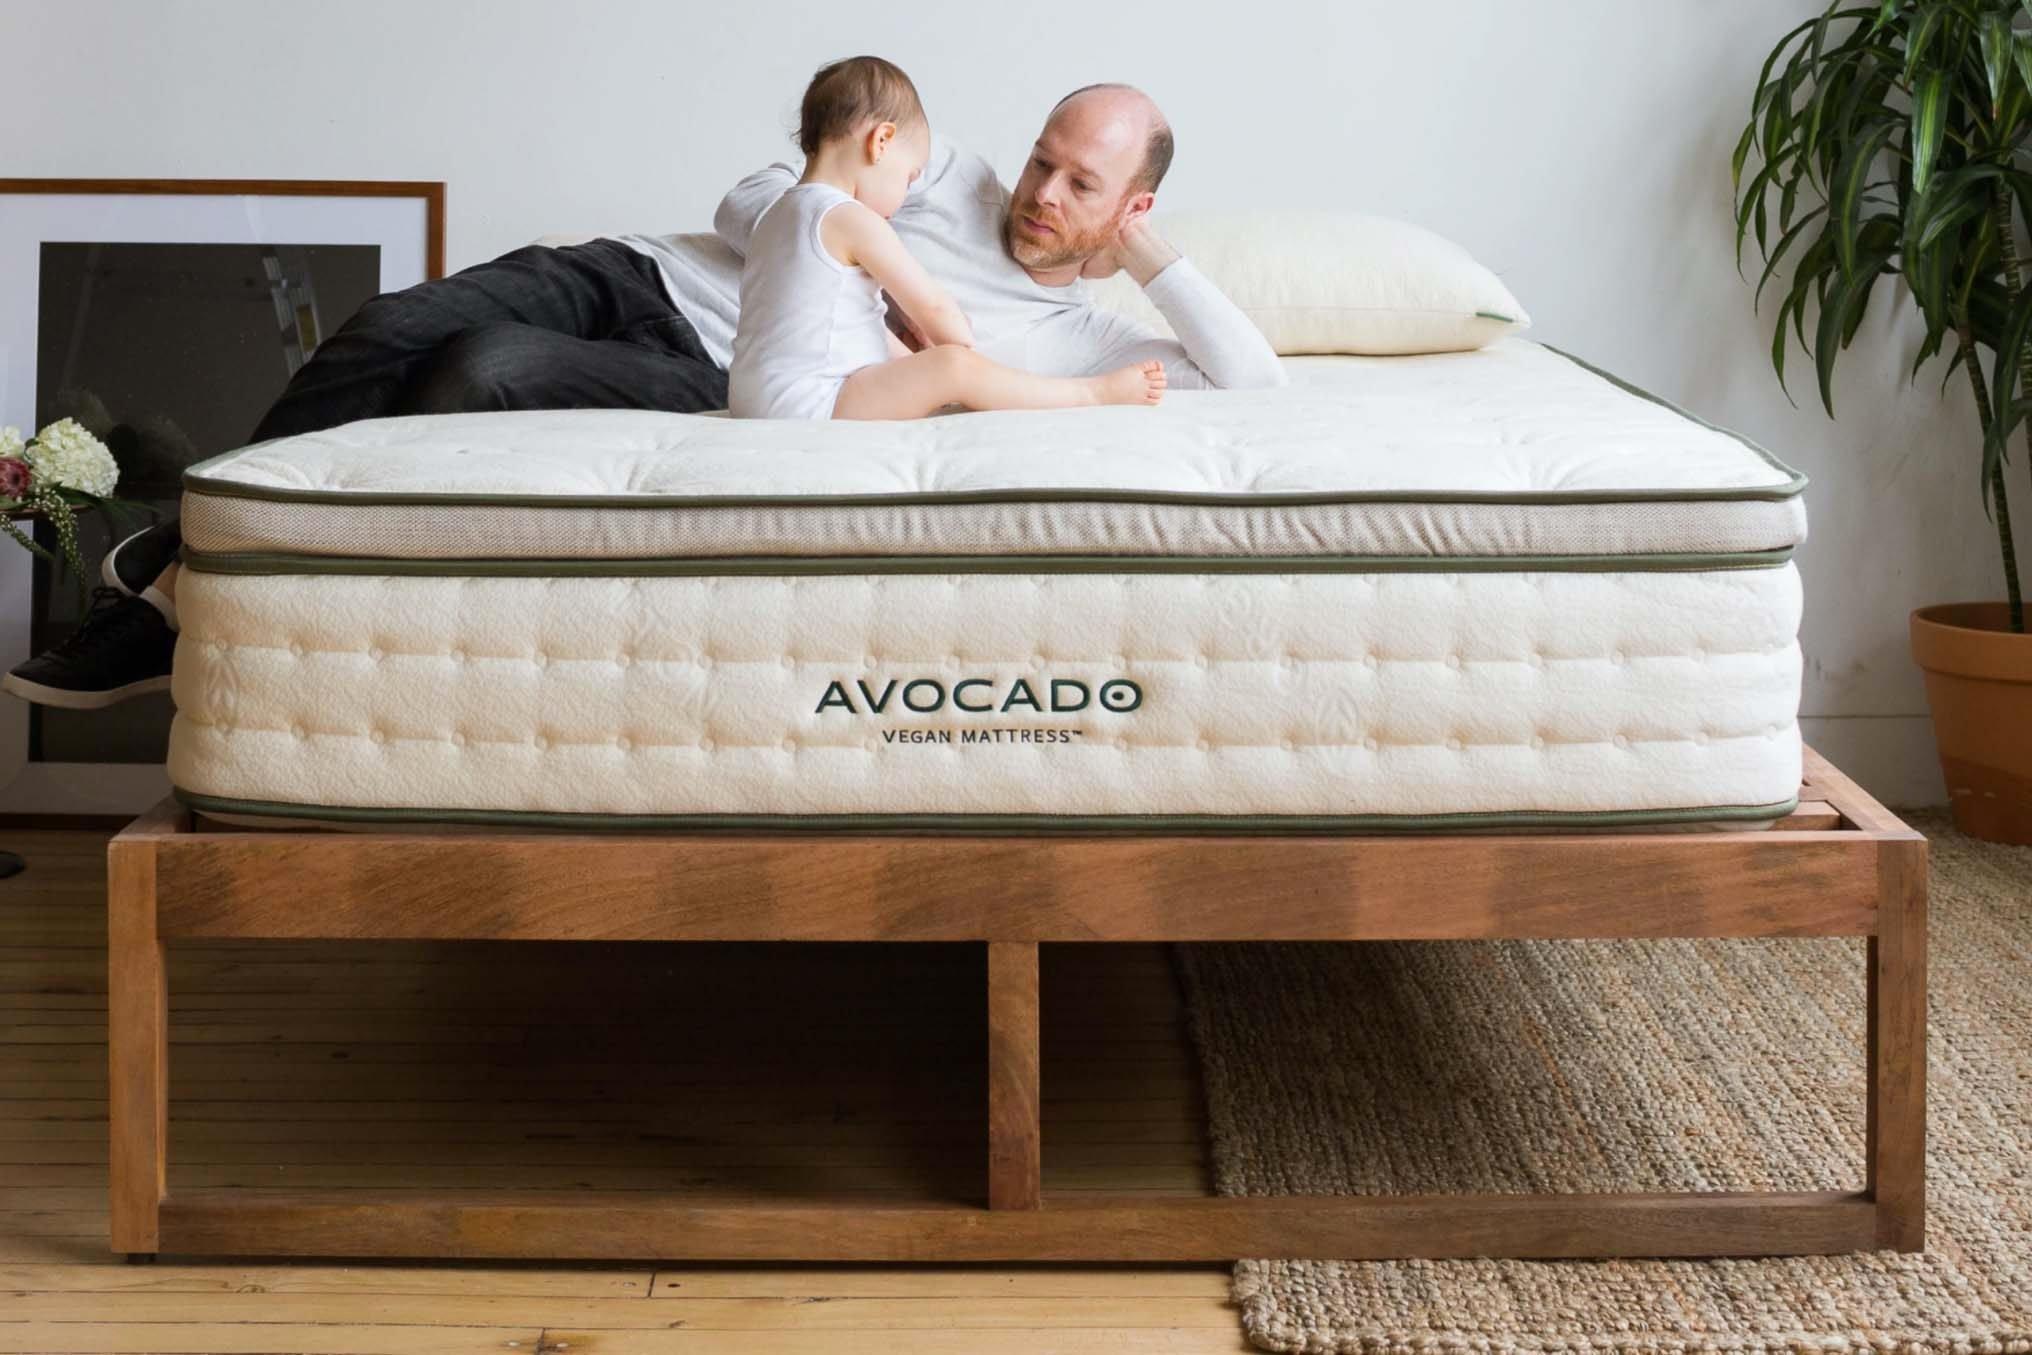 Avocado Vegan Mattress